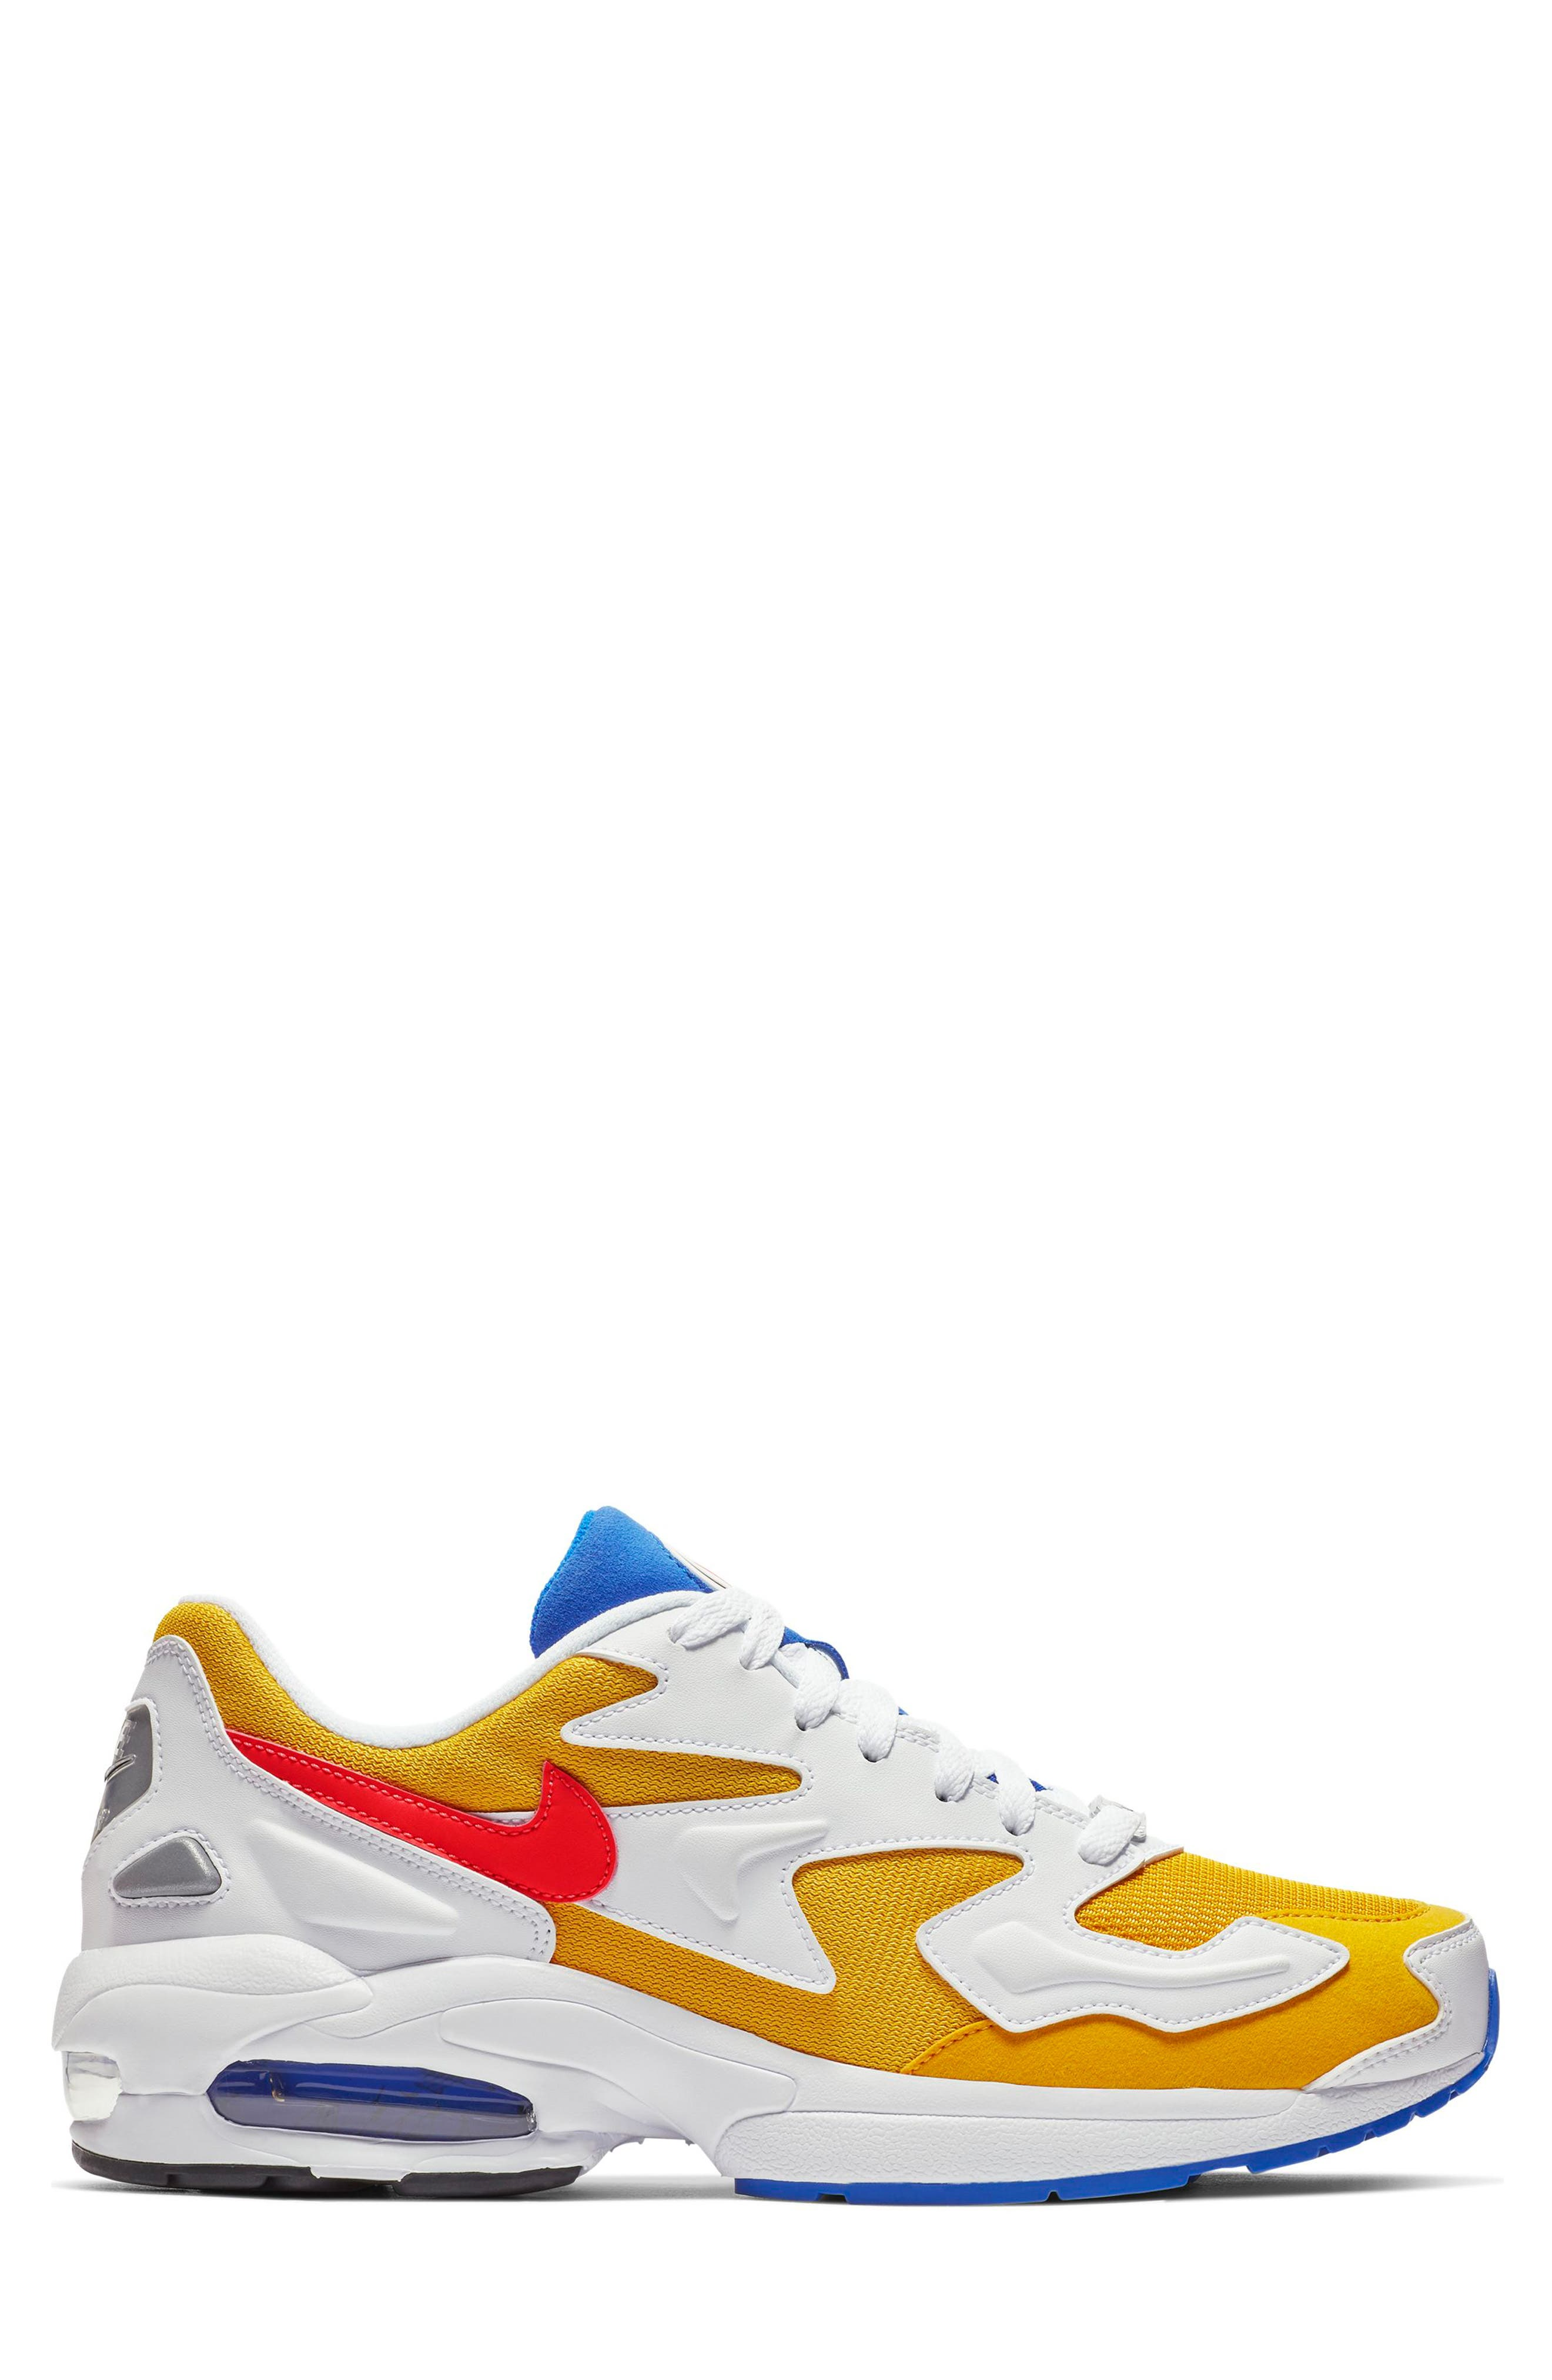 NIKE,                             Air Max2 Light Sneaker,                             Alternate thumbnail 3, color,                             GOLD CRIMSON/ BLUE